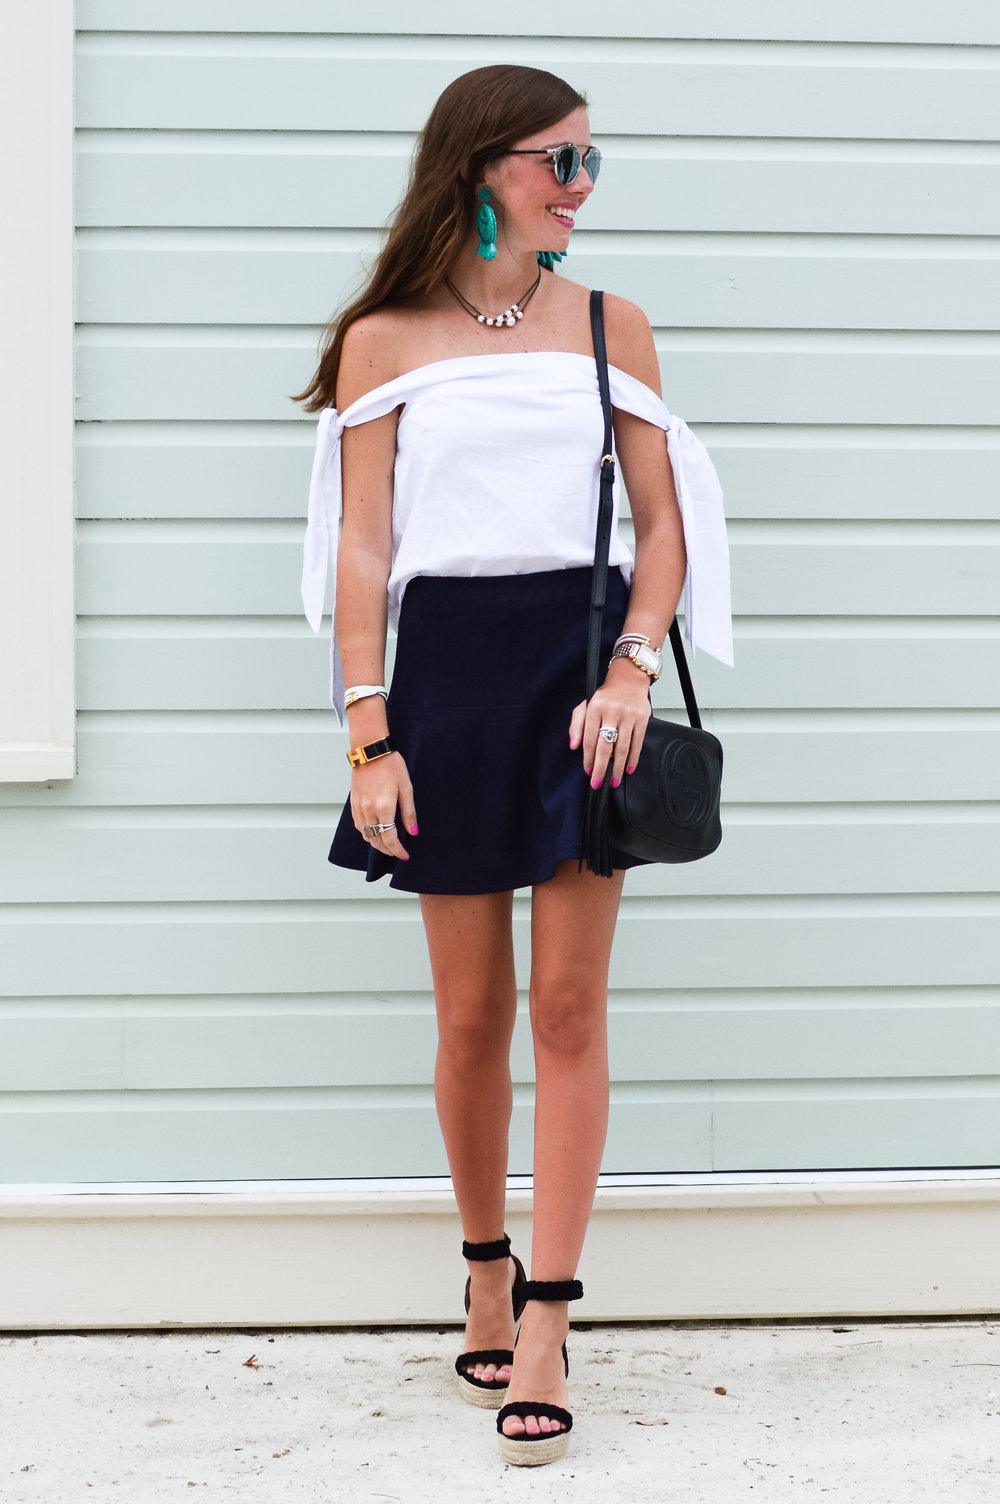 fashion blogger lcb style seaside florida beach (5 of 46).jpg